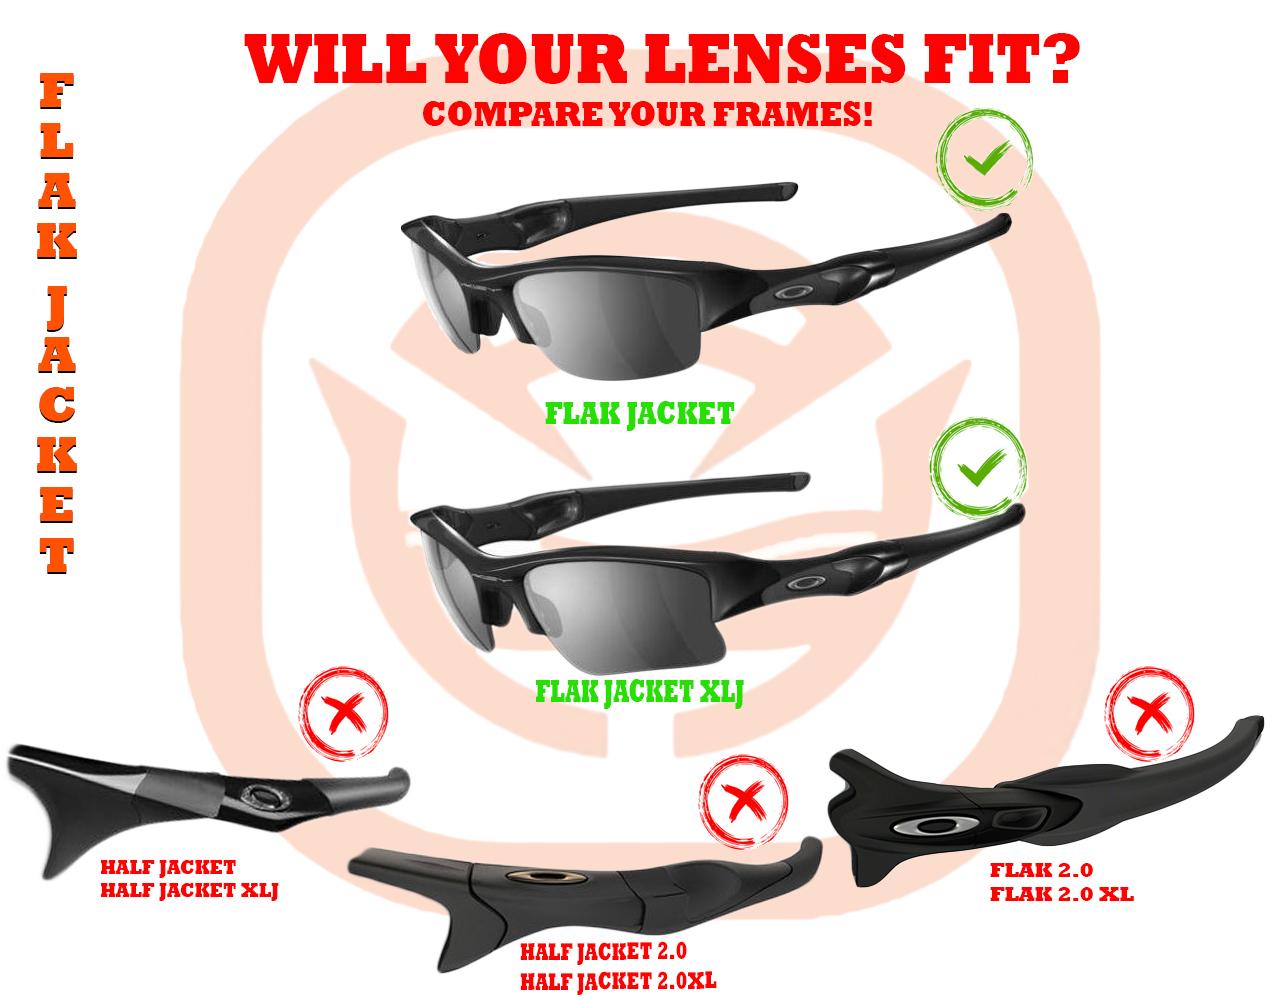 b22ae2bb3f FLAK JACKET XLJ Replacement Lenses   Accessories Kit by SEEK OPTICS ...